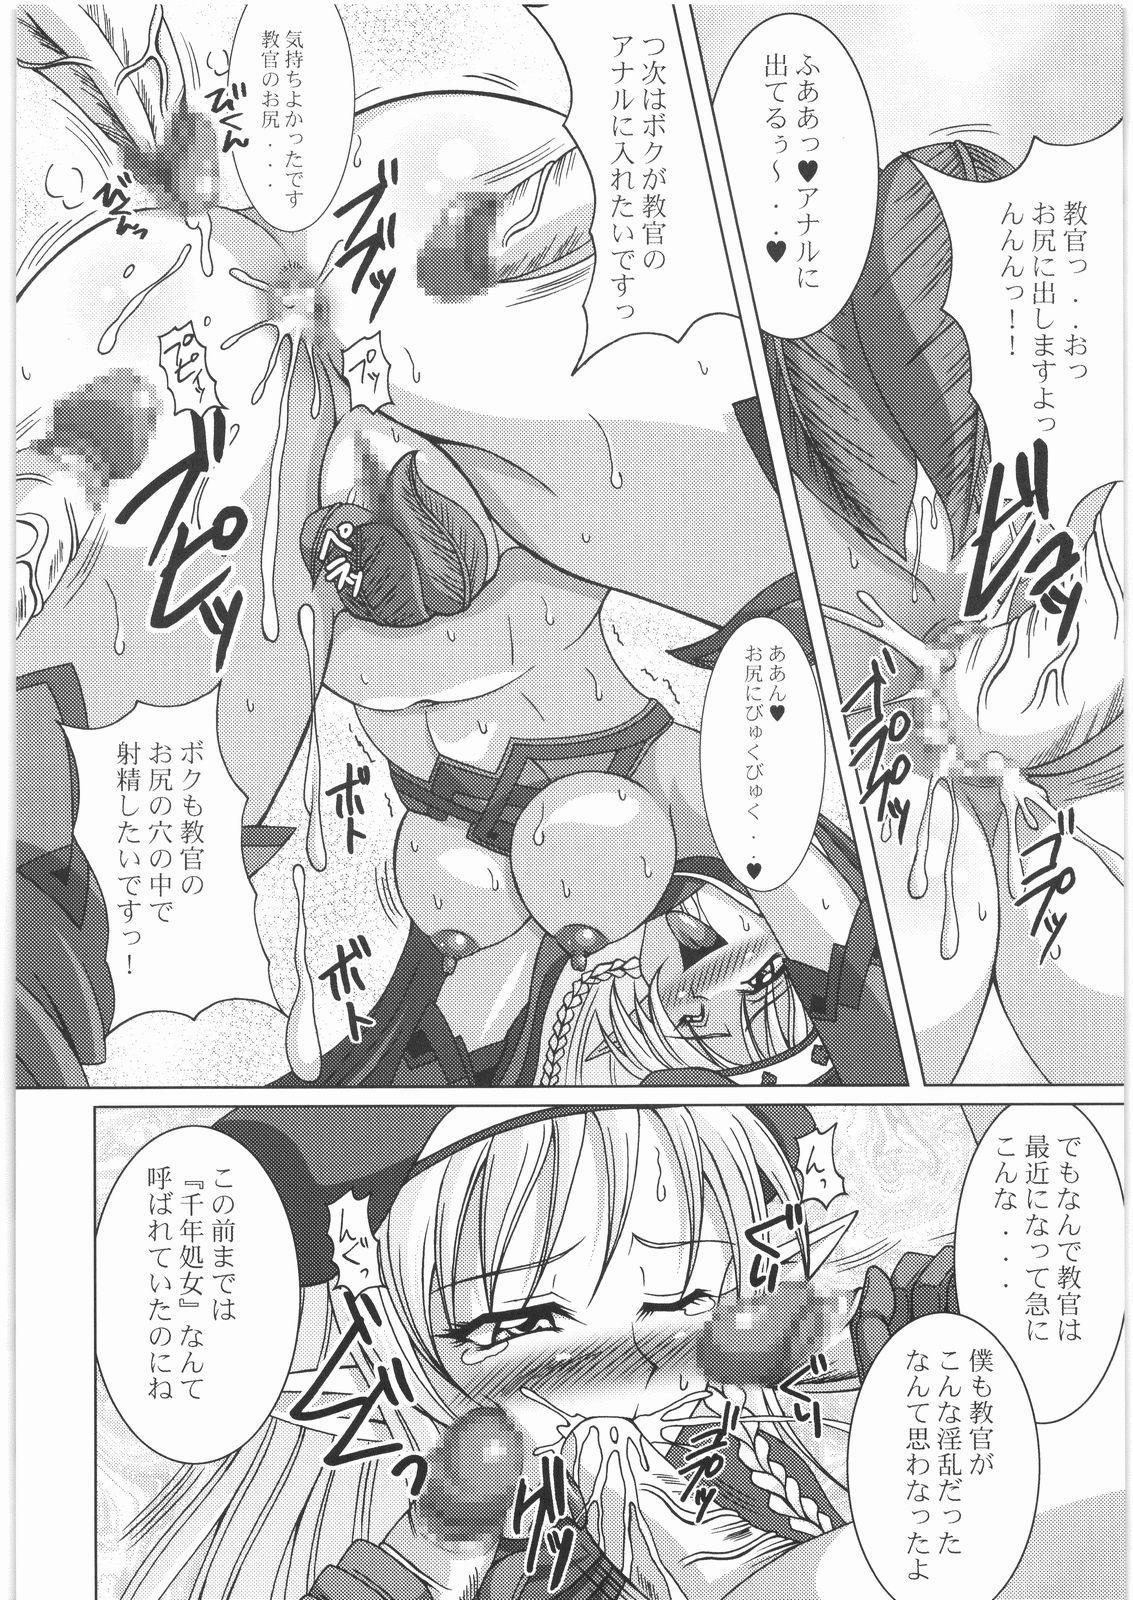 Strike Kyoukan 4